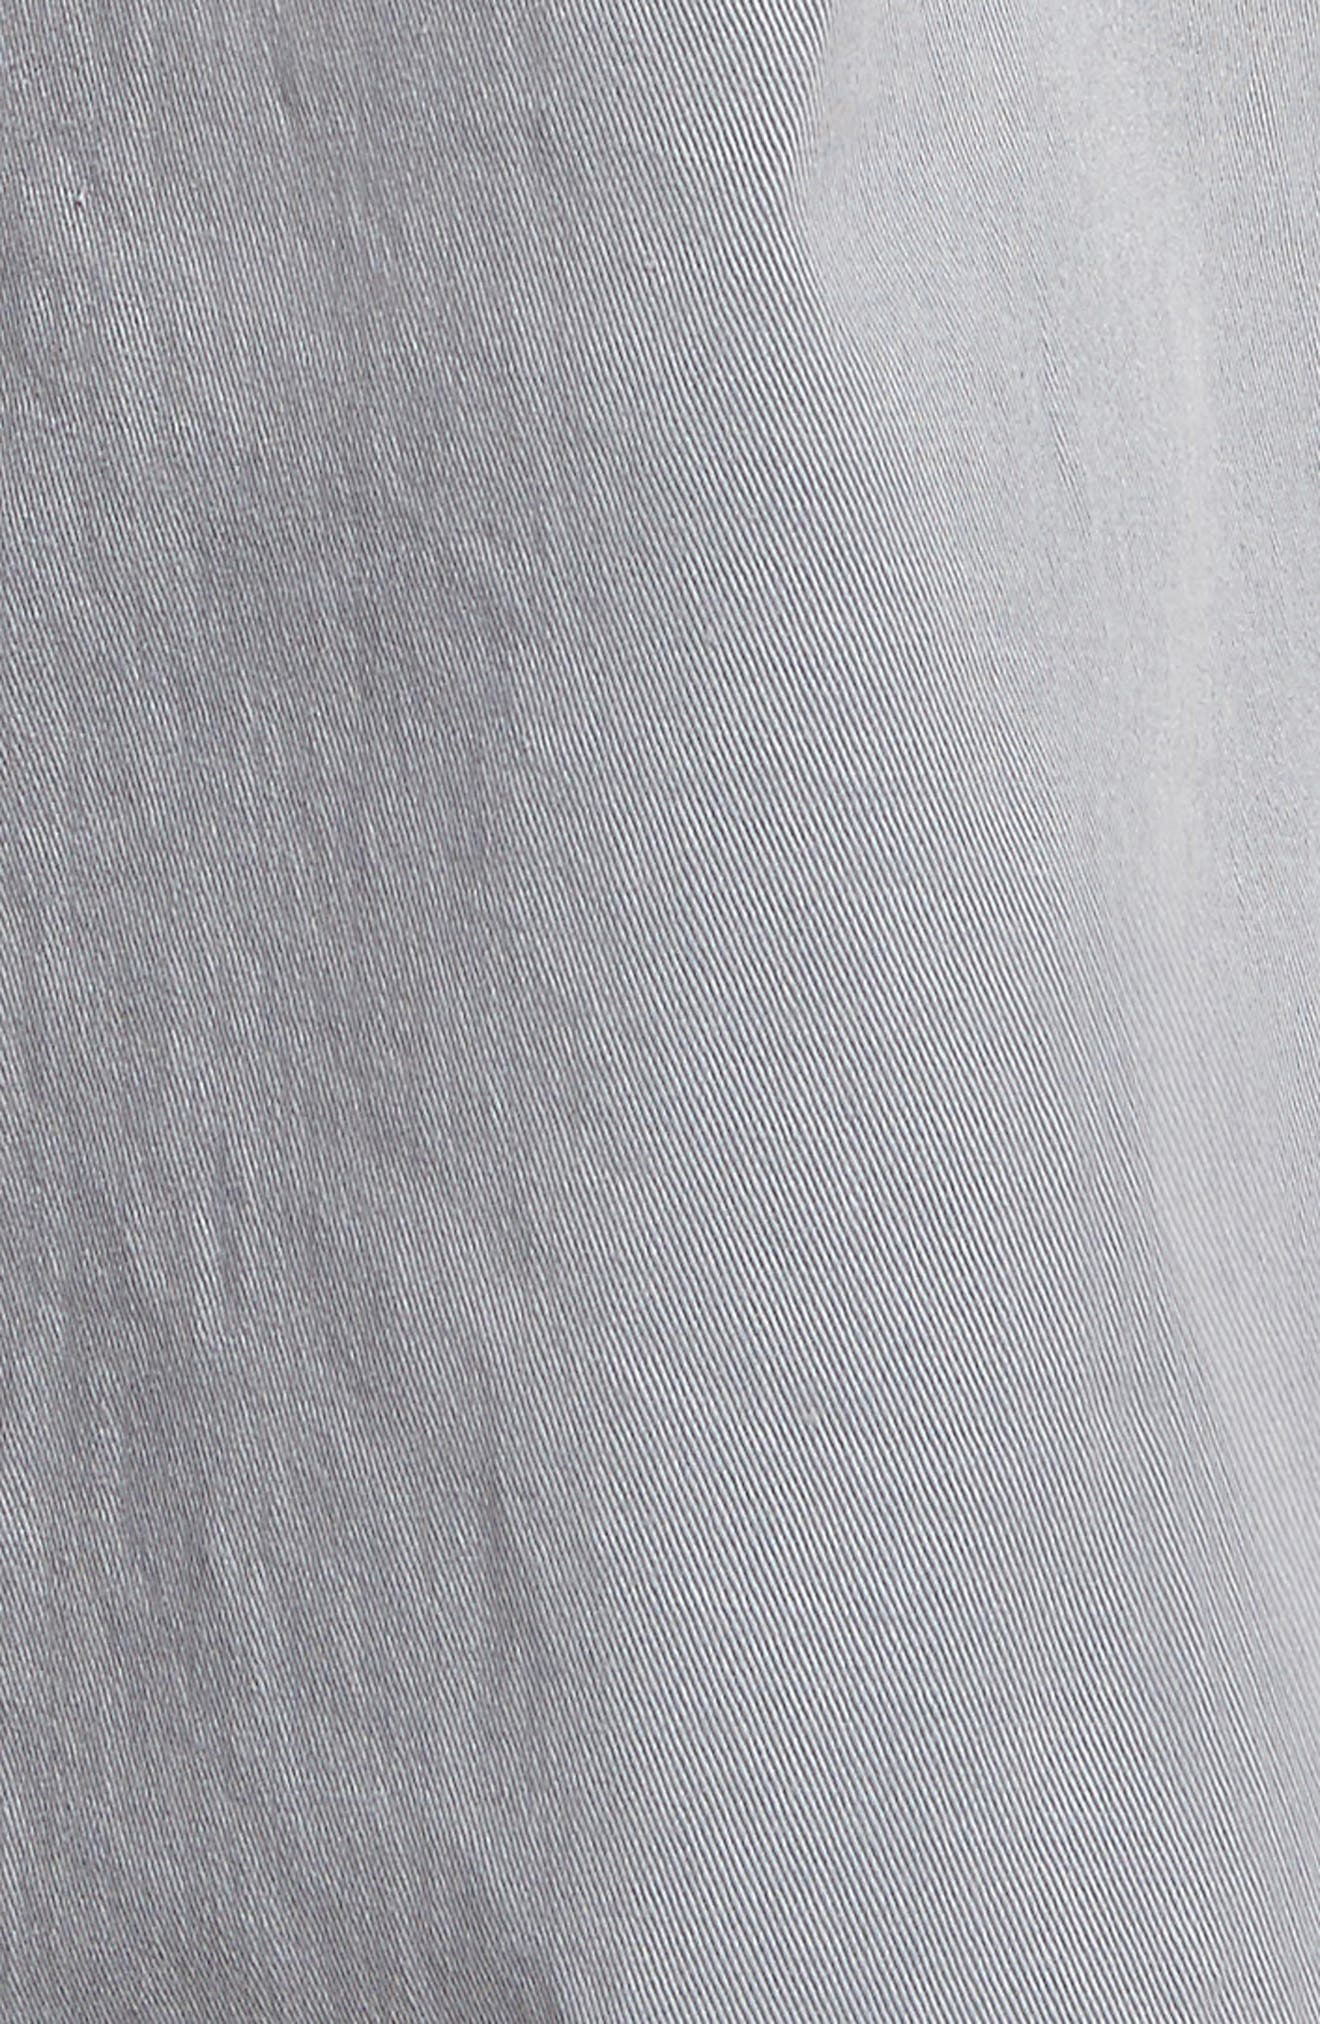 Belmont Stretch Chino Pants,                             Alternate thumbnail 5, color,                             020